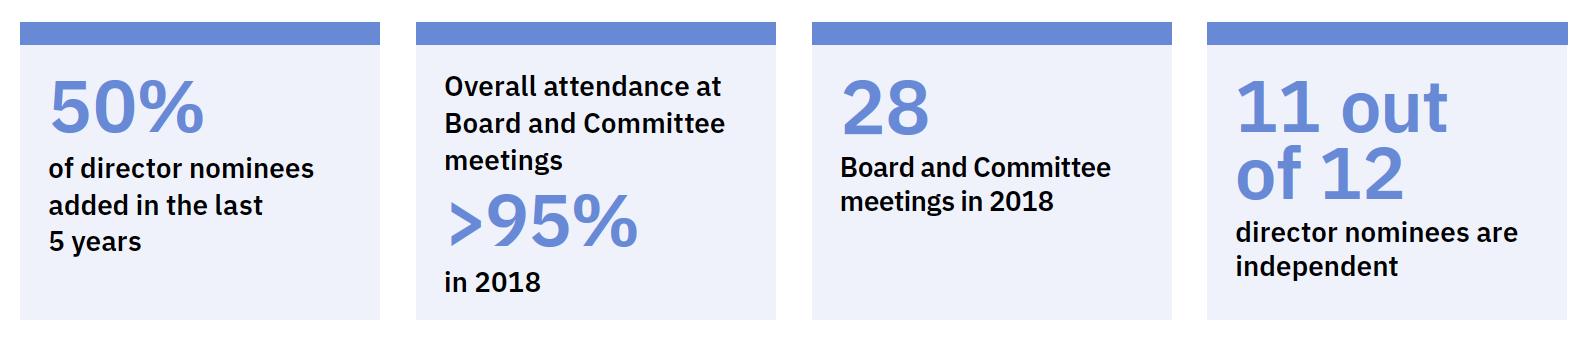 IBM Investor relations - Corporate governance | IBM Board of